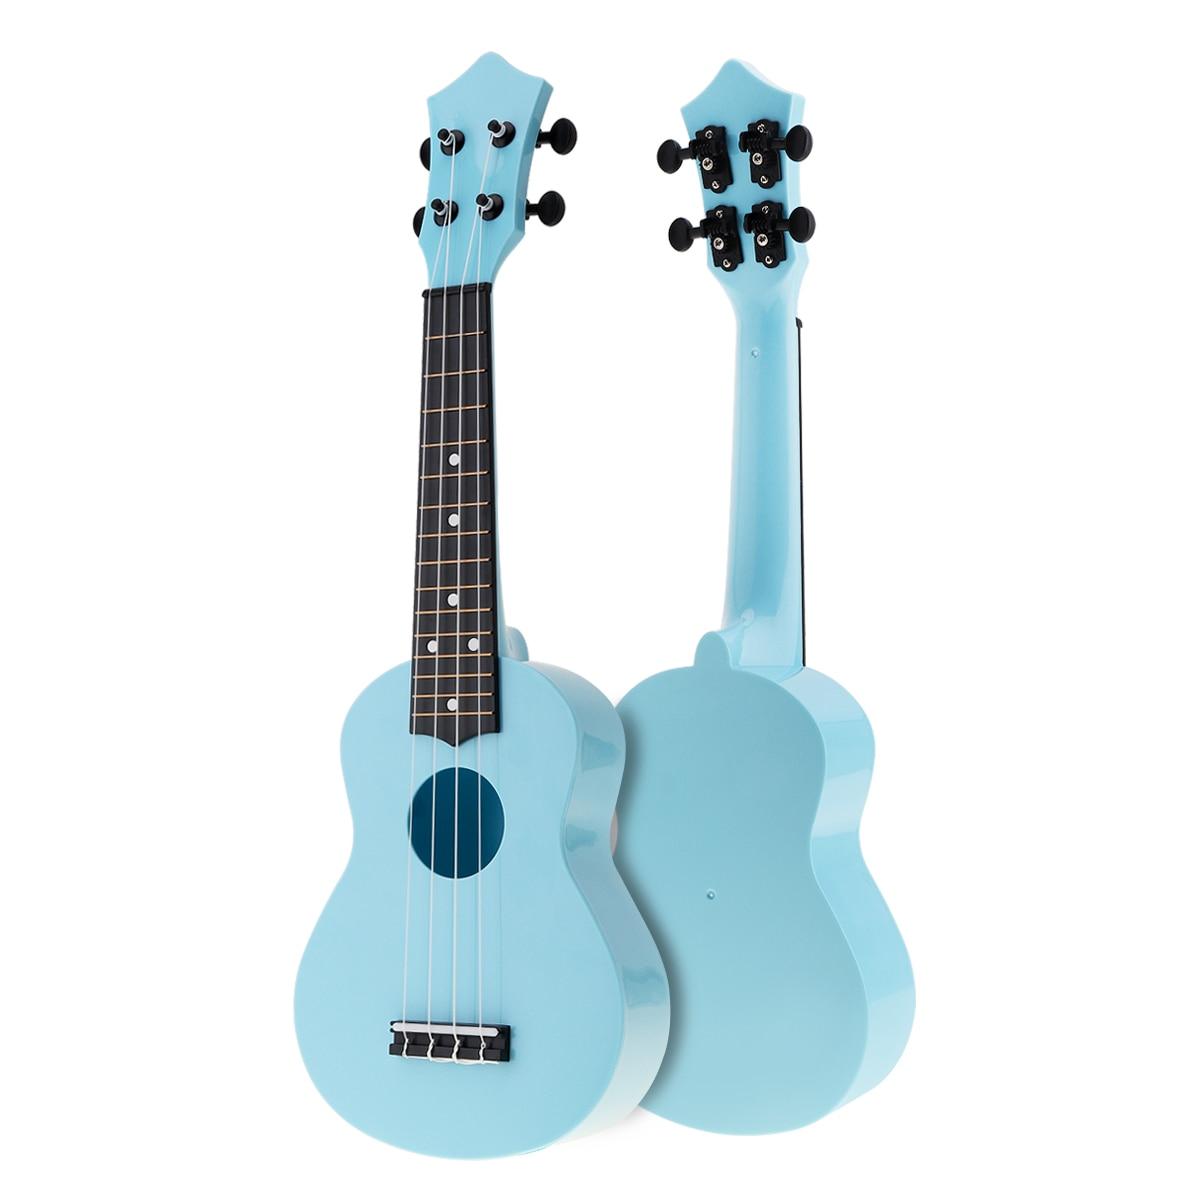 21 Inch Colorful Acoustic Uke Ukulele 4 Strings Hawaii Guitar Guitarra Instrument for Kids and Music Beginner enlarge